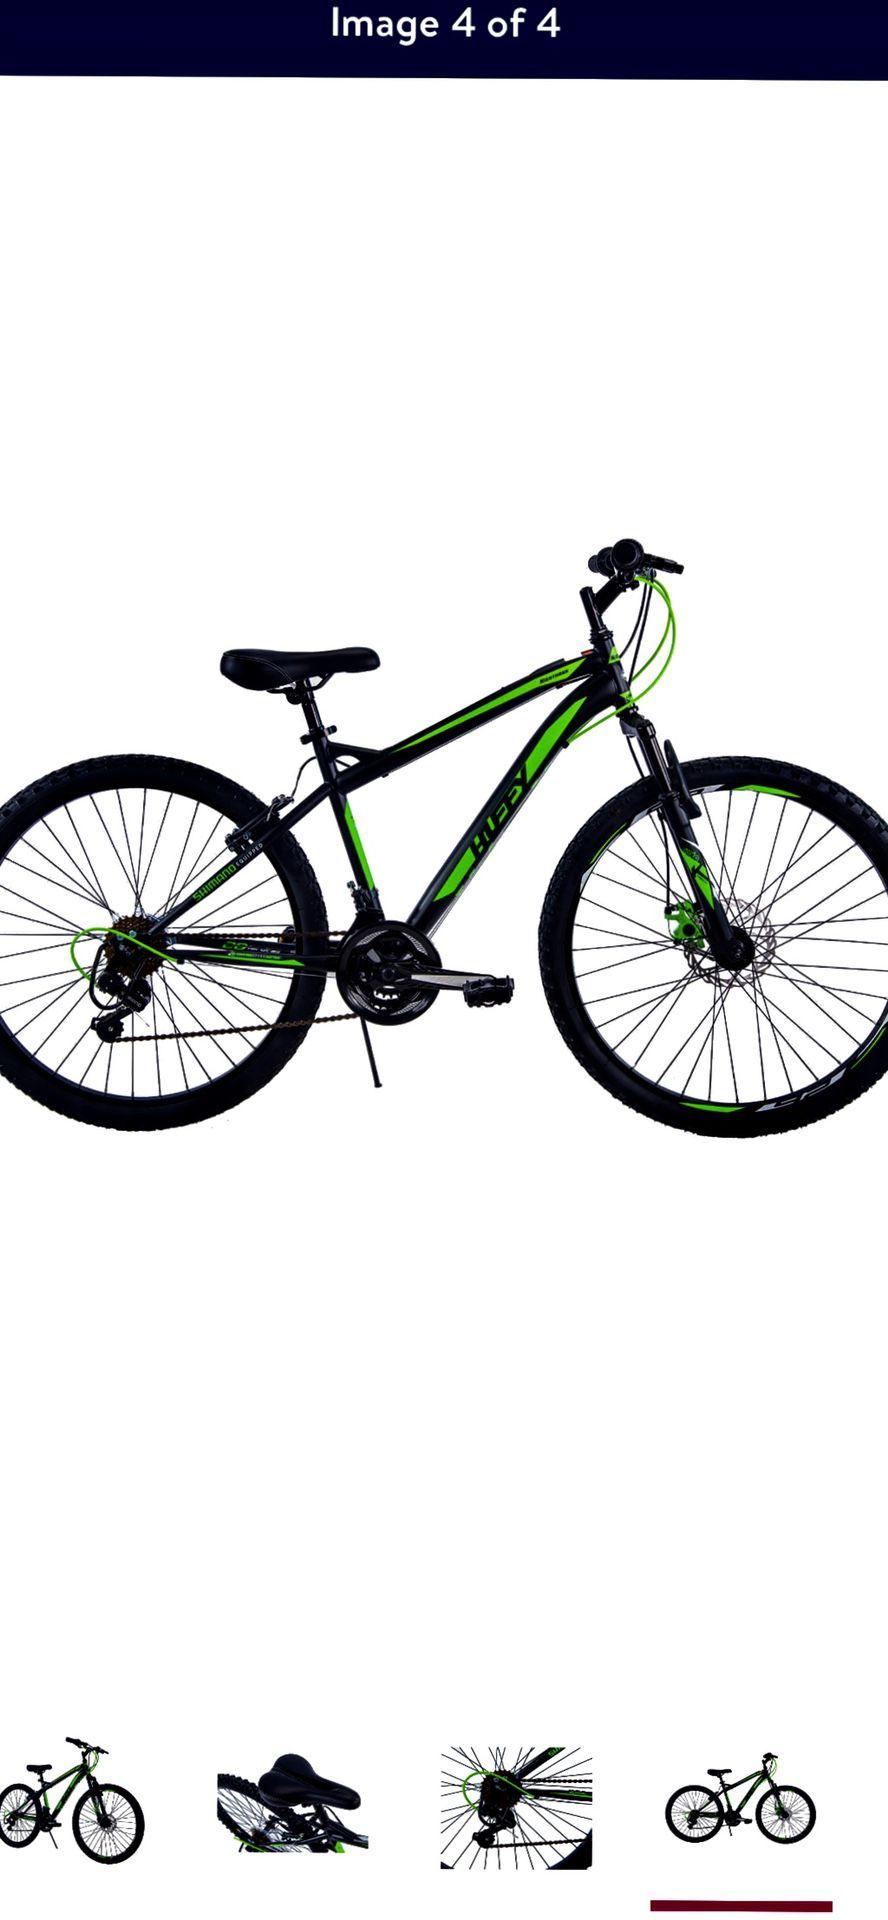 Bike brand new